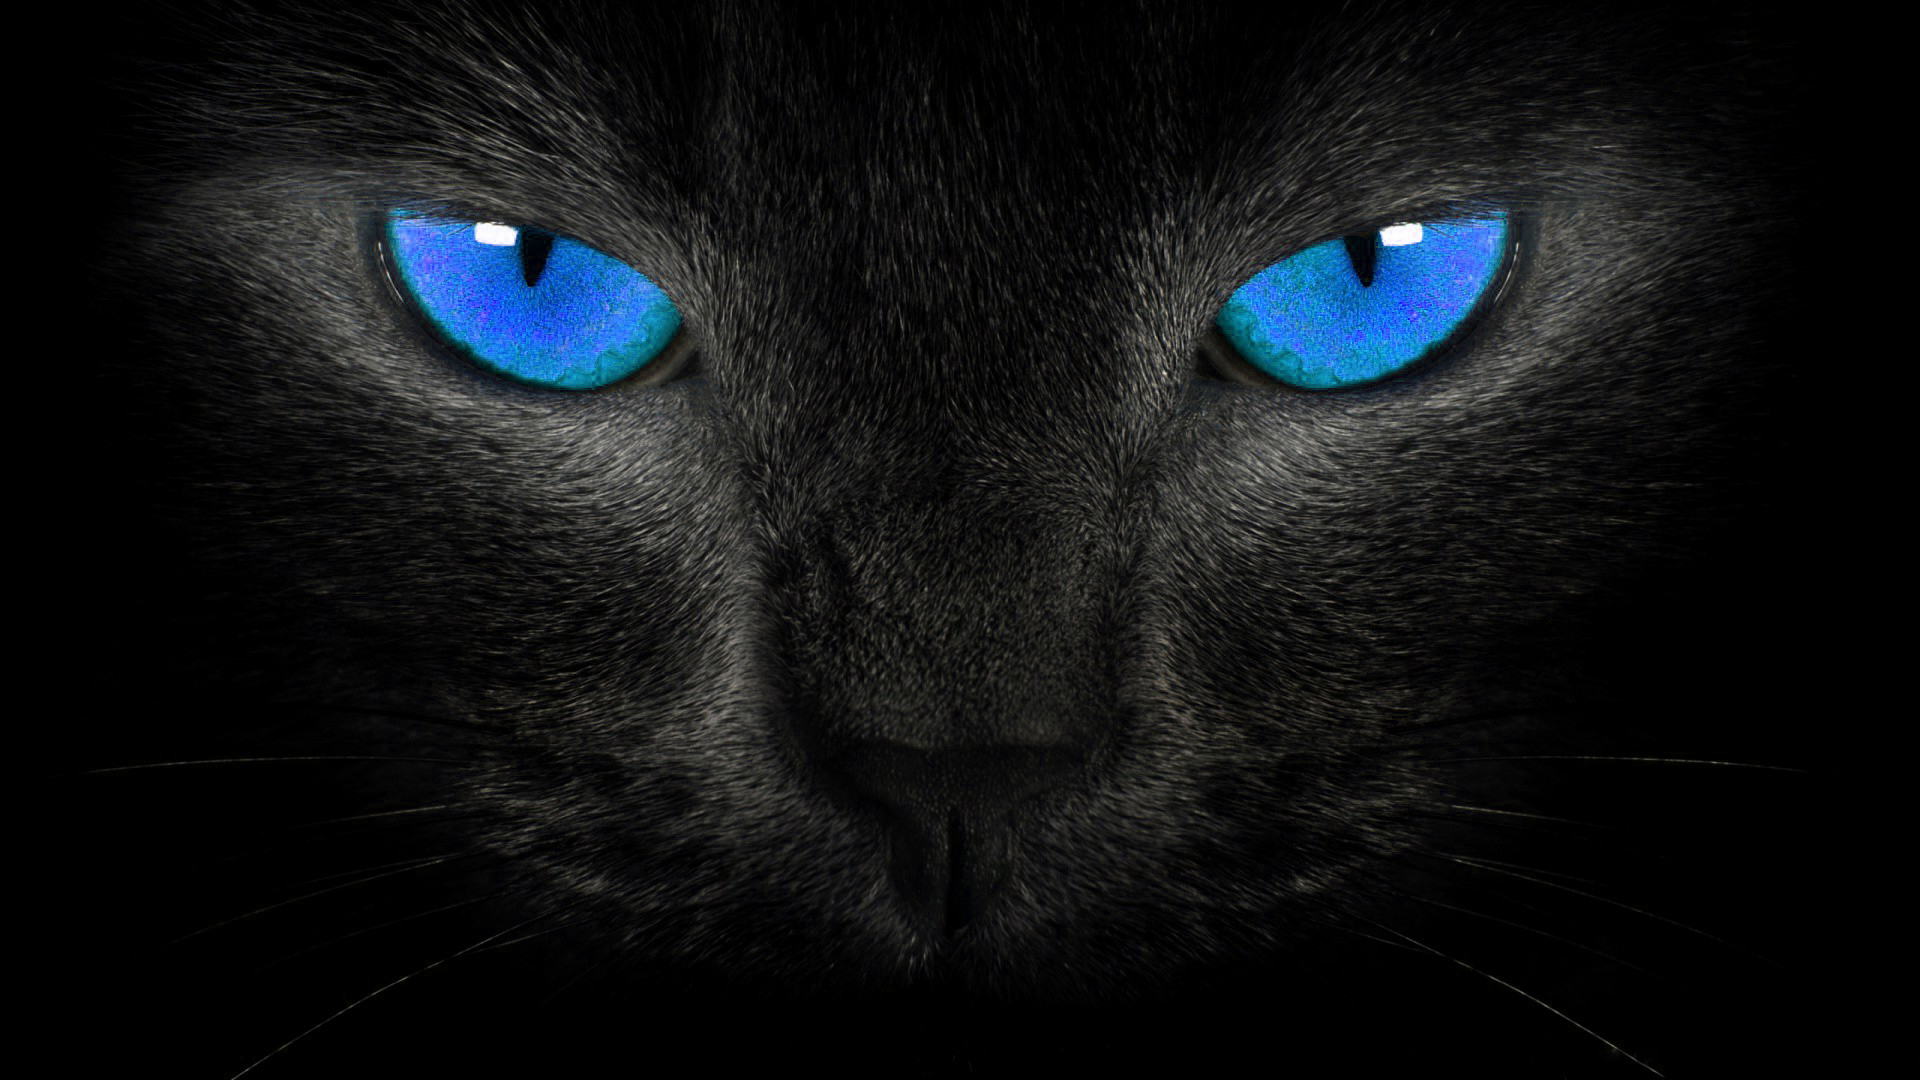 black cat blue eyes wallpaper hd widescreen wallpapers animals photo 1920x1080